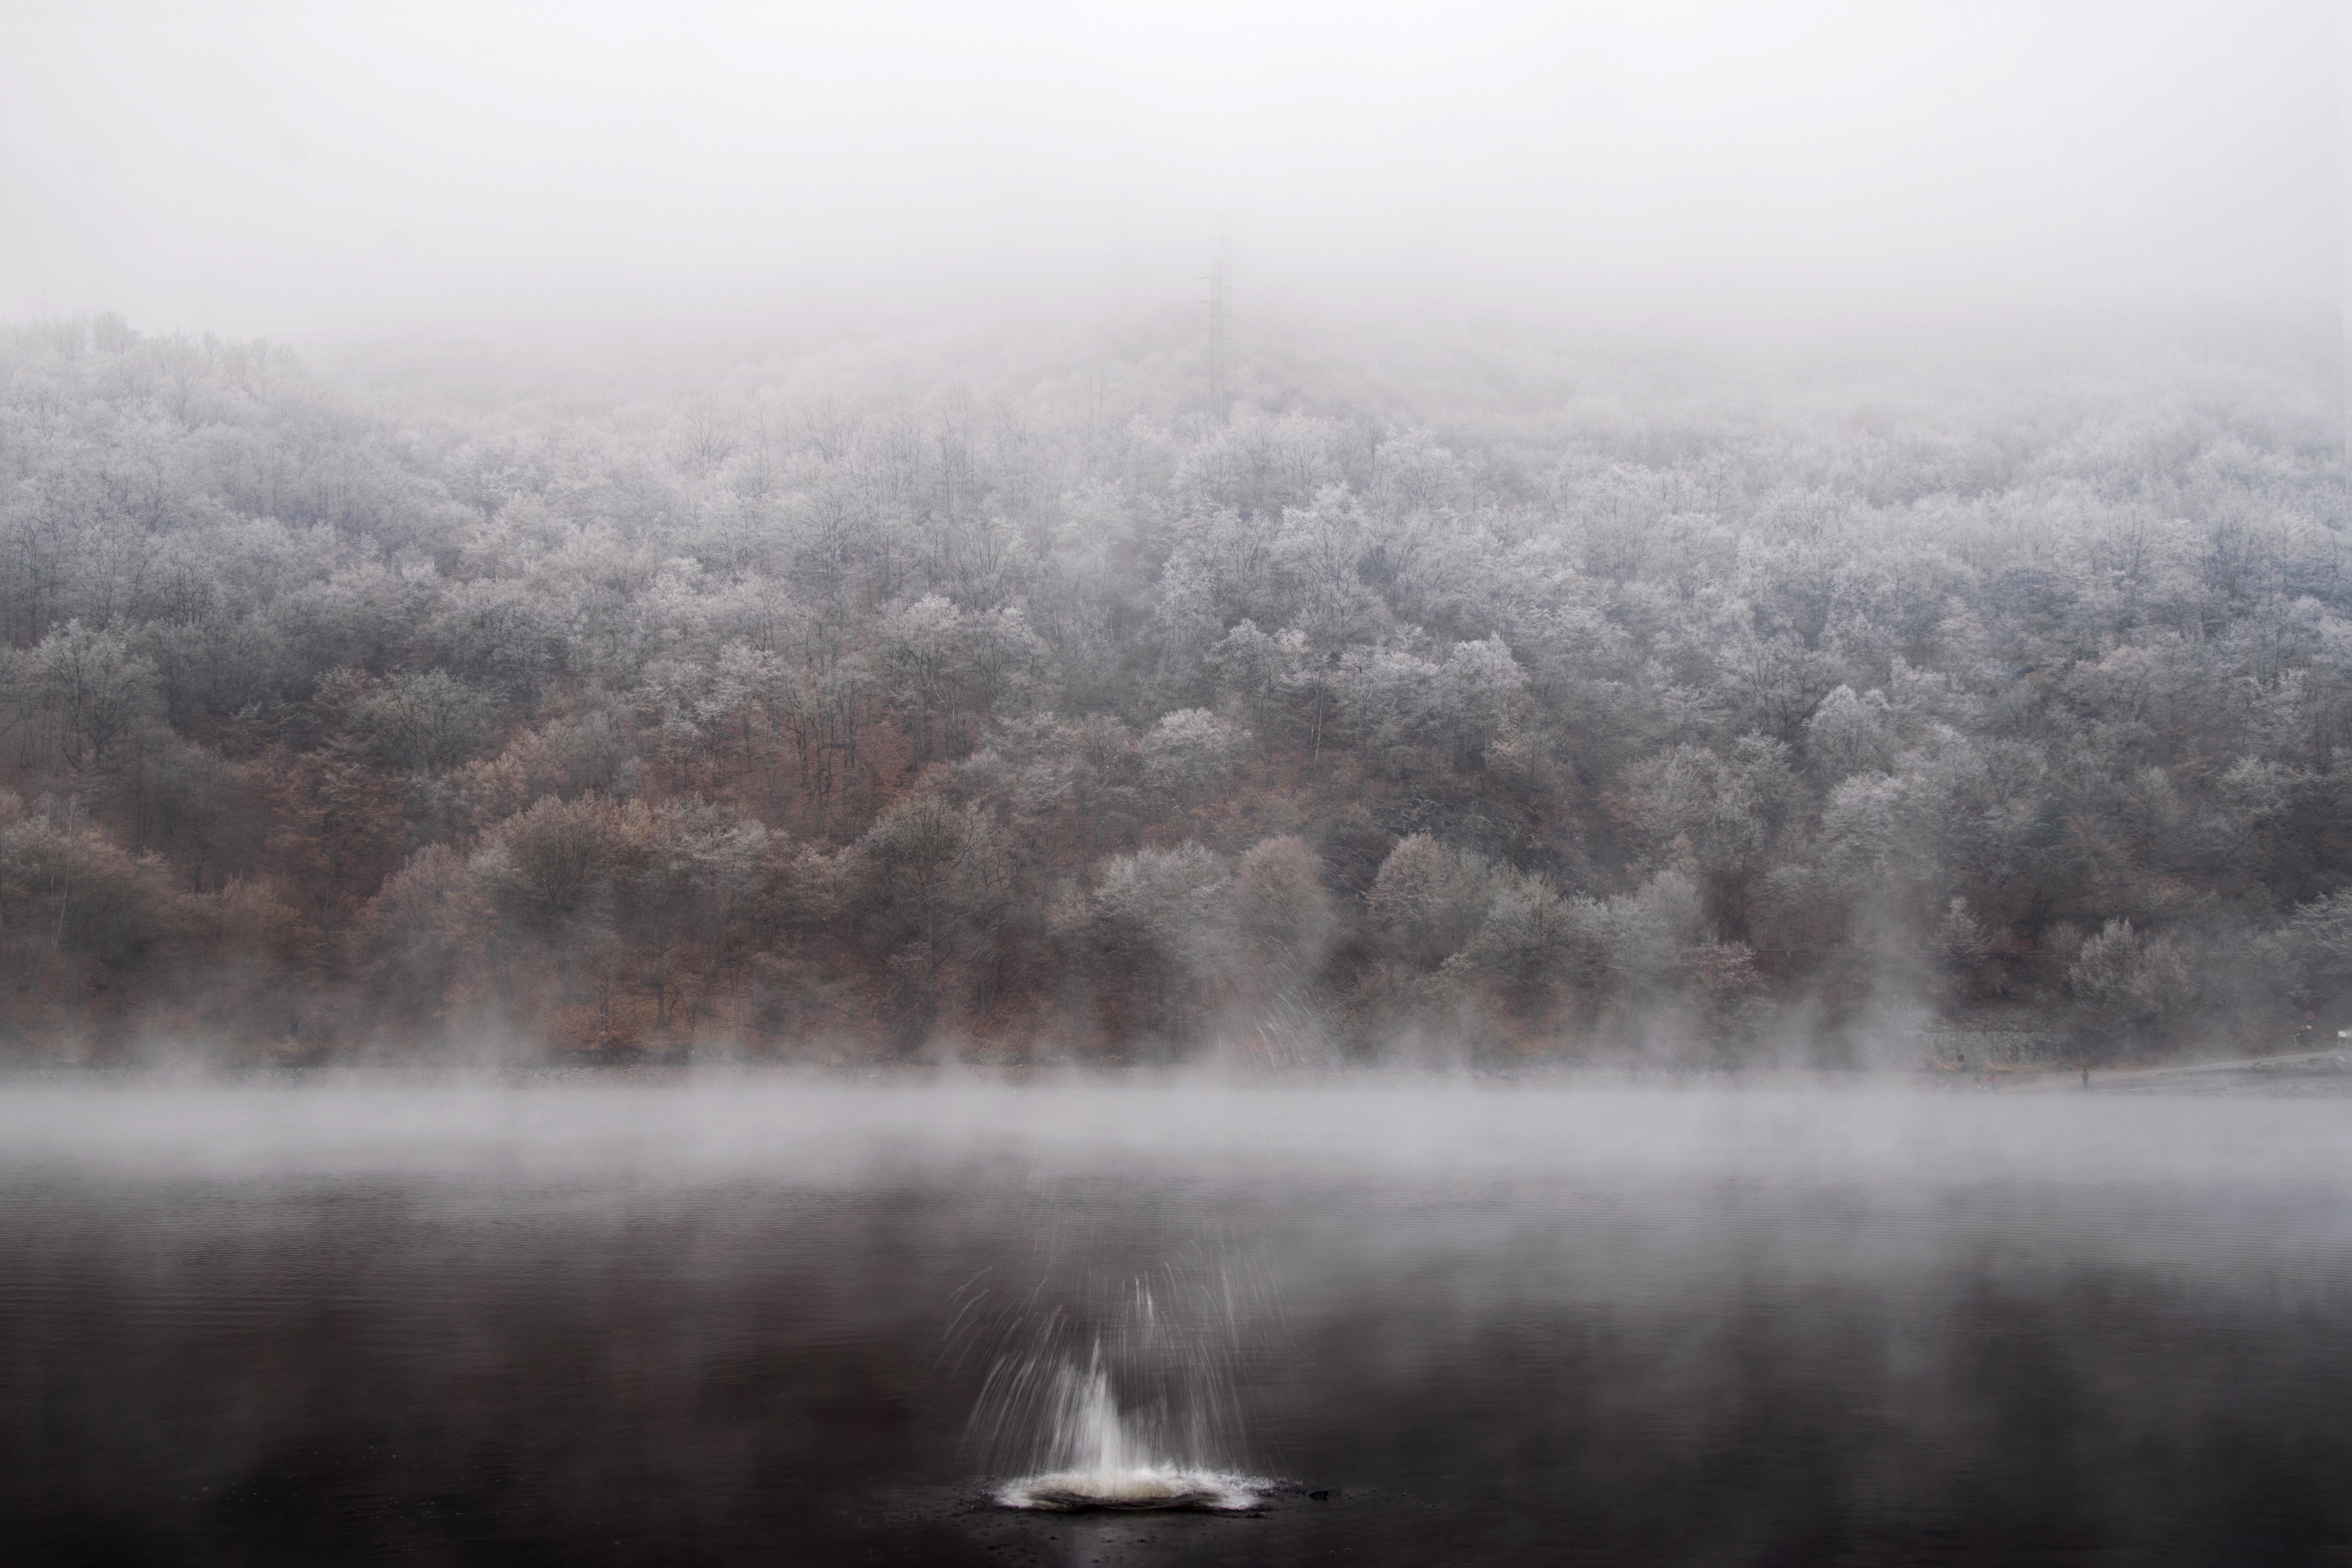 JSEM | Fotka měsíce Nikonblogu –prosinec 2016 | Oliver Beneš / Misty morning over Vltava river